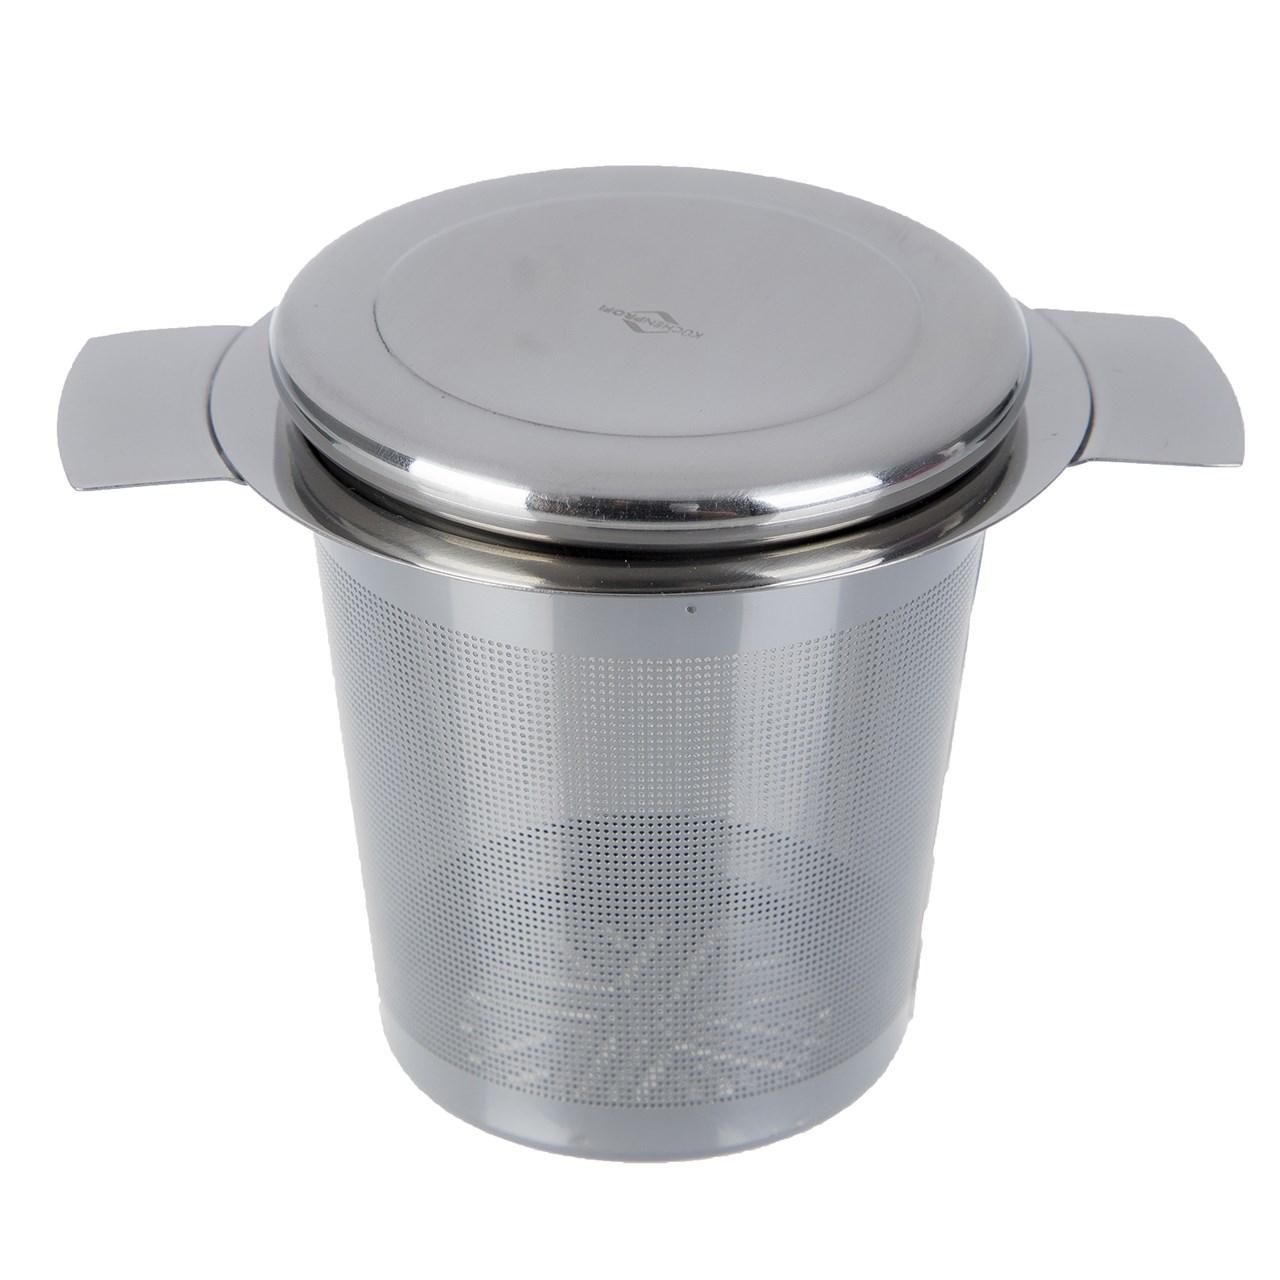 صافی چای کوچن پروفی کد 1045302800